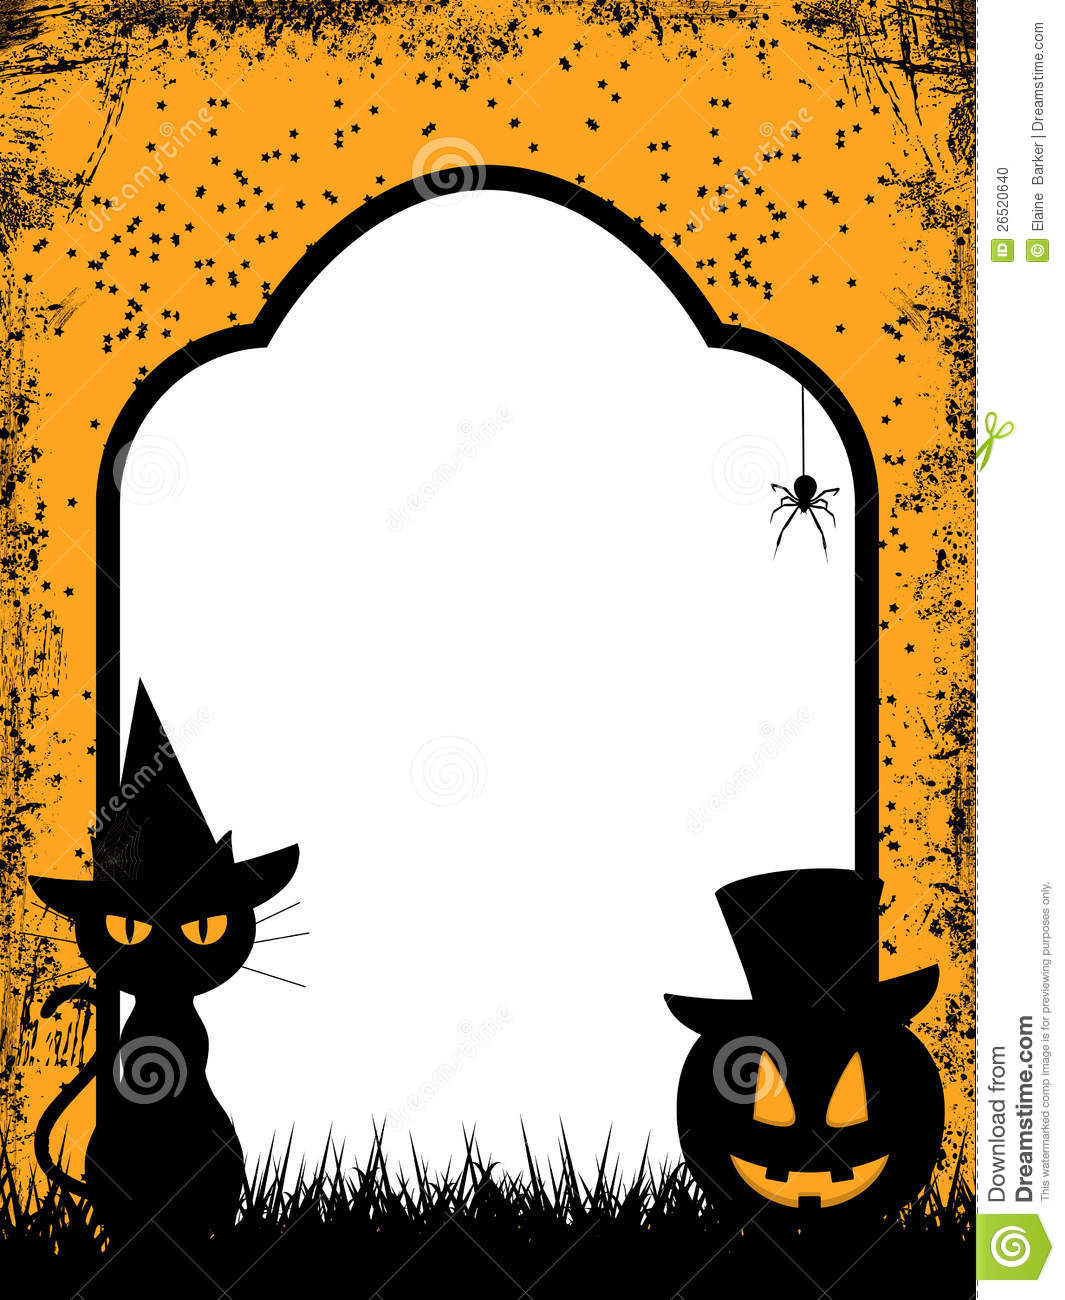 Halloween clip art borders banner freeuse stock Halloween Borders Clipart - Clipart Kid banner freeuse stock